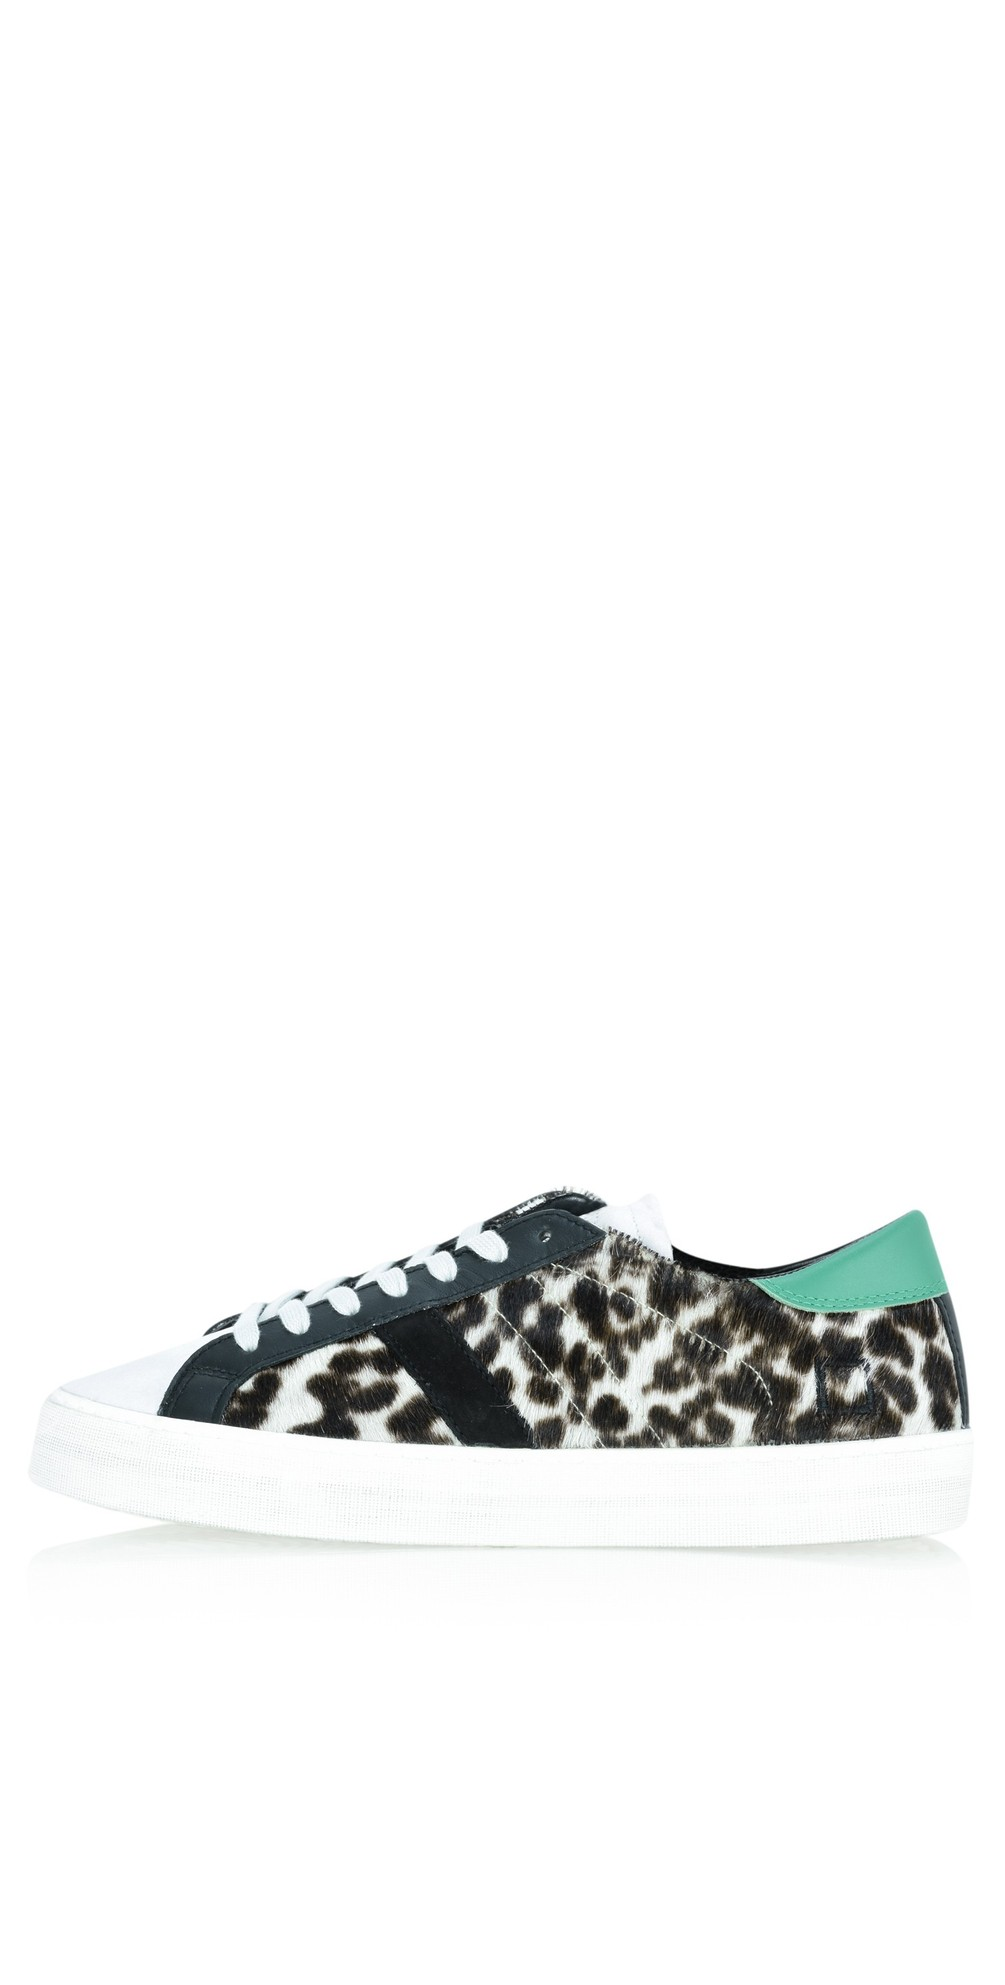 Hill Animal leopard Trainer Shoe main image